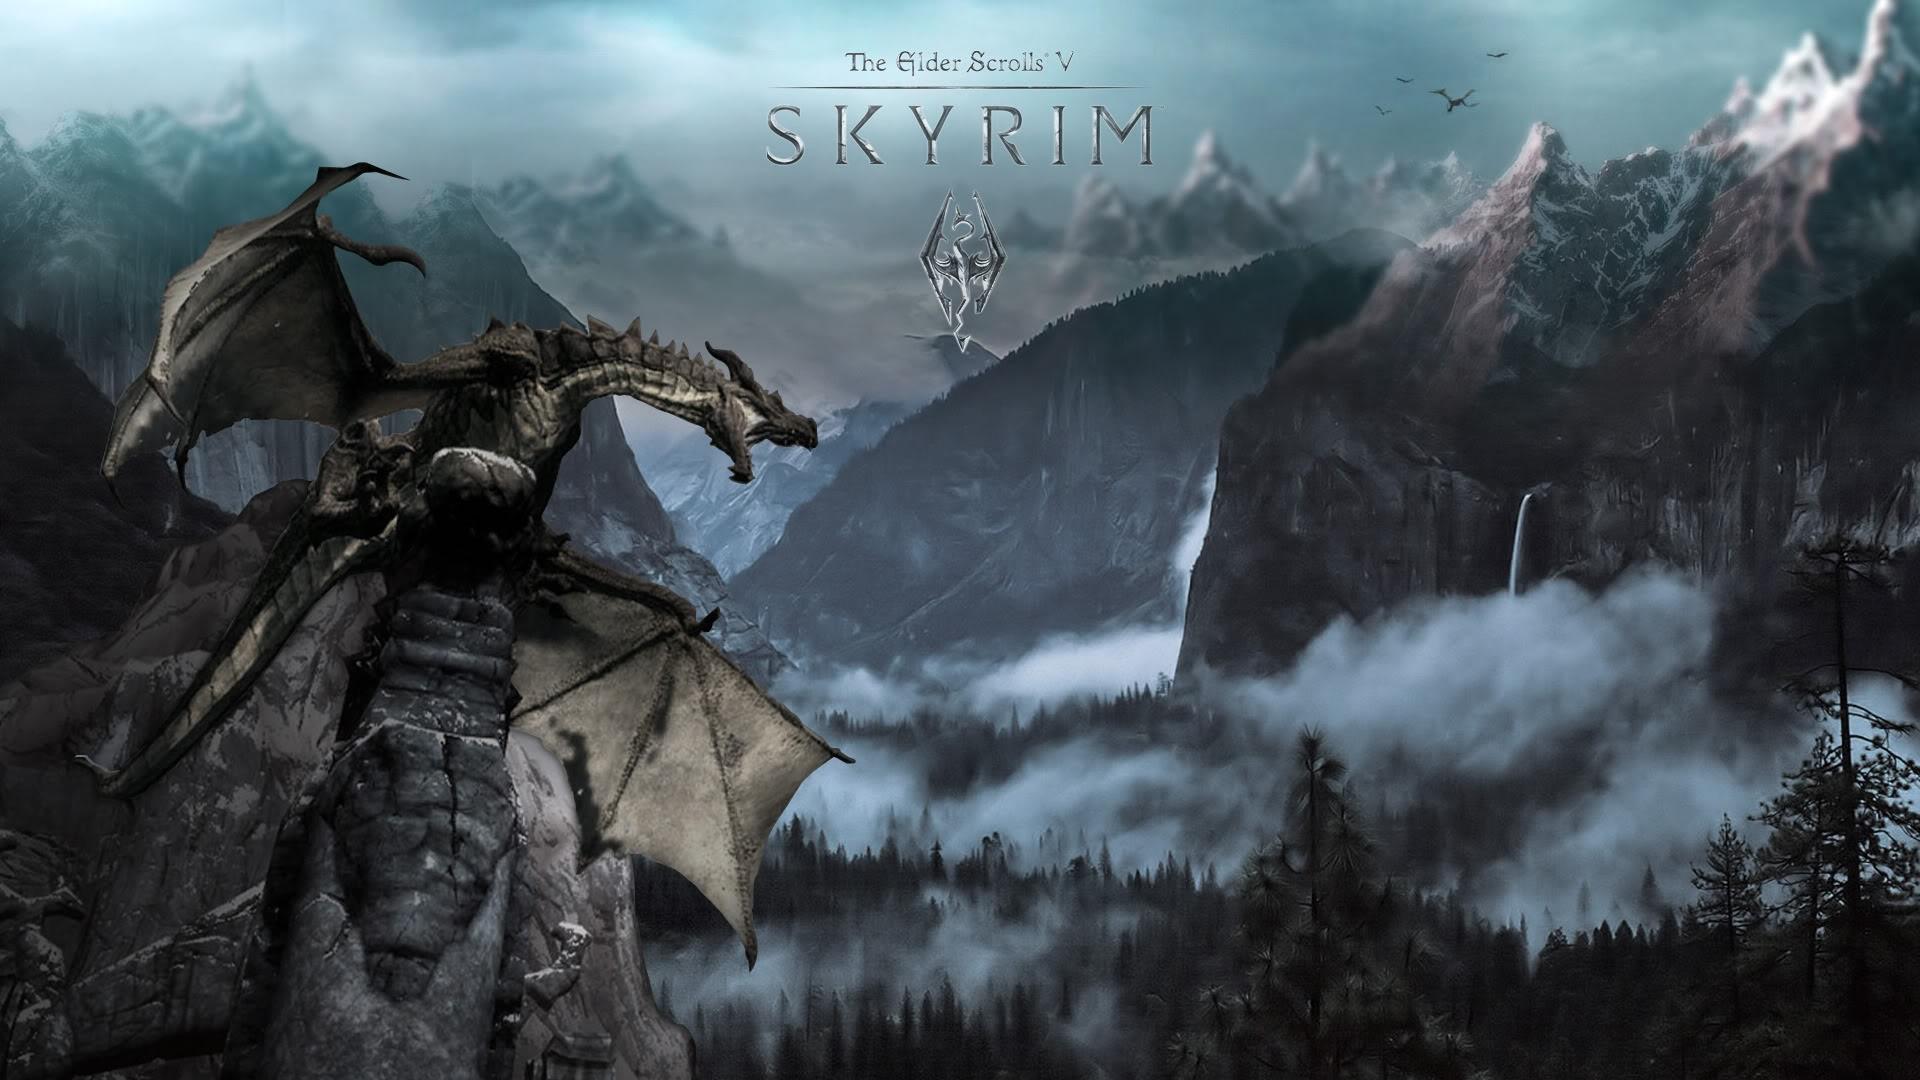 skyrim wallpaper hd ·① download free stunning high resolution